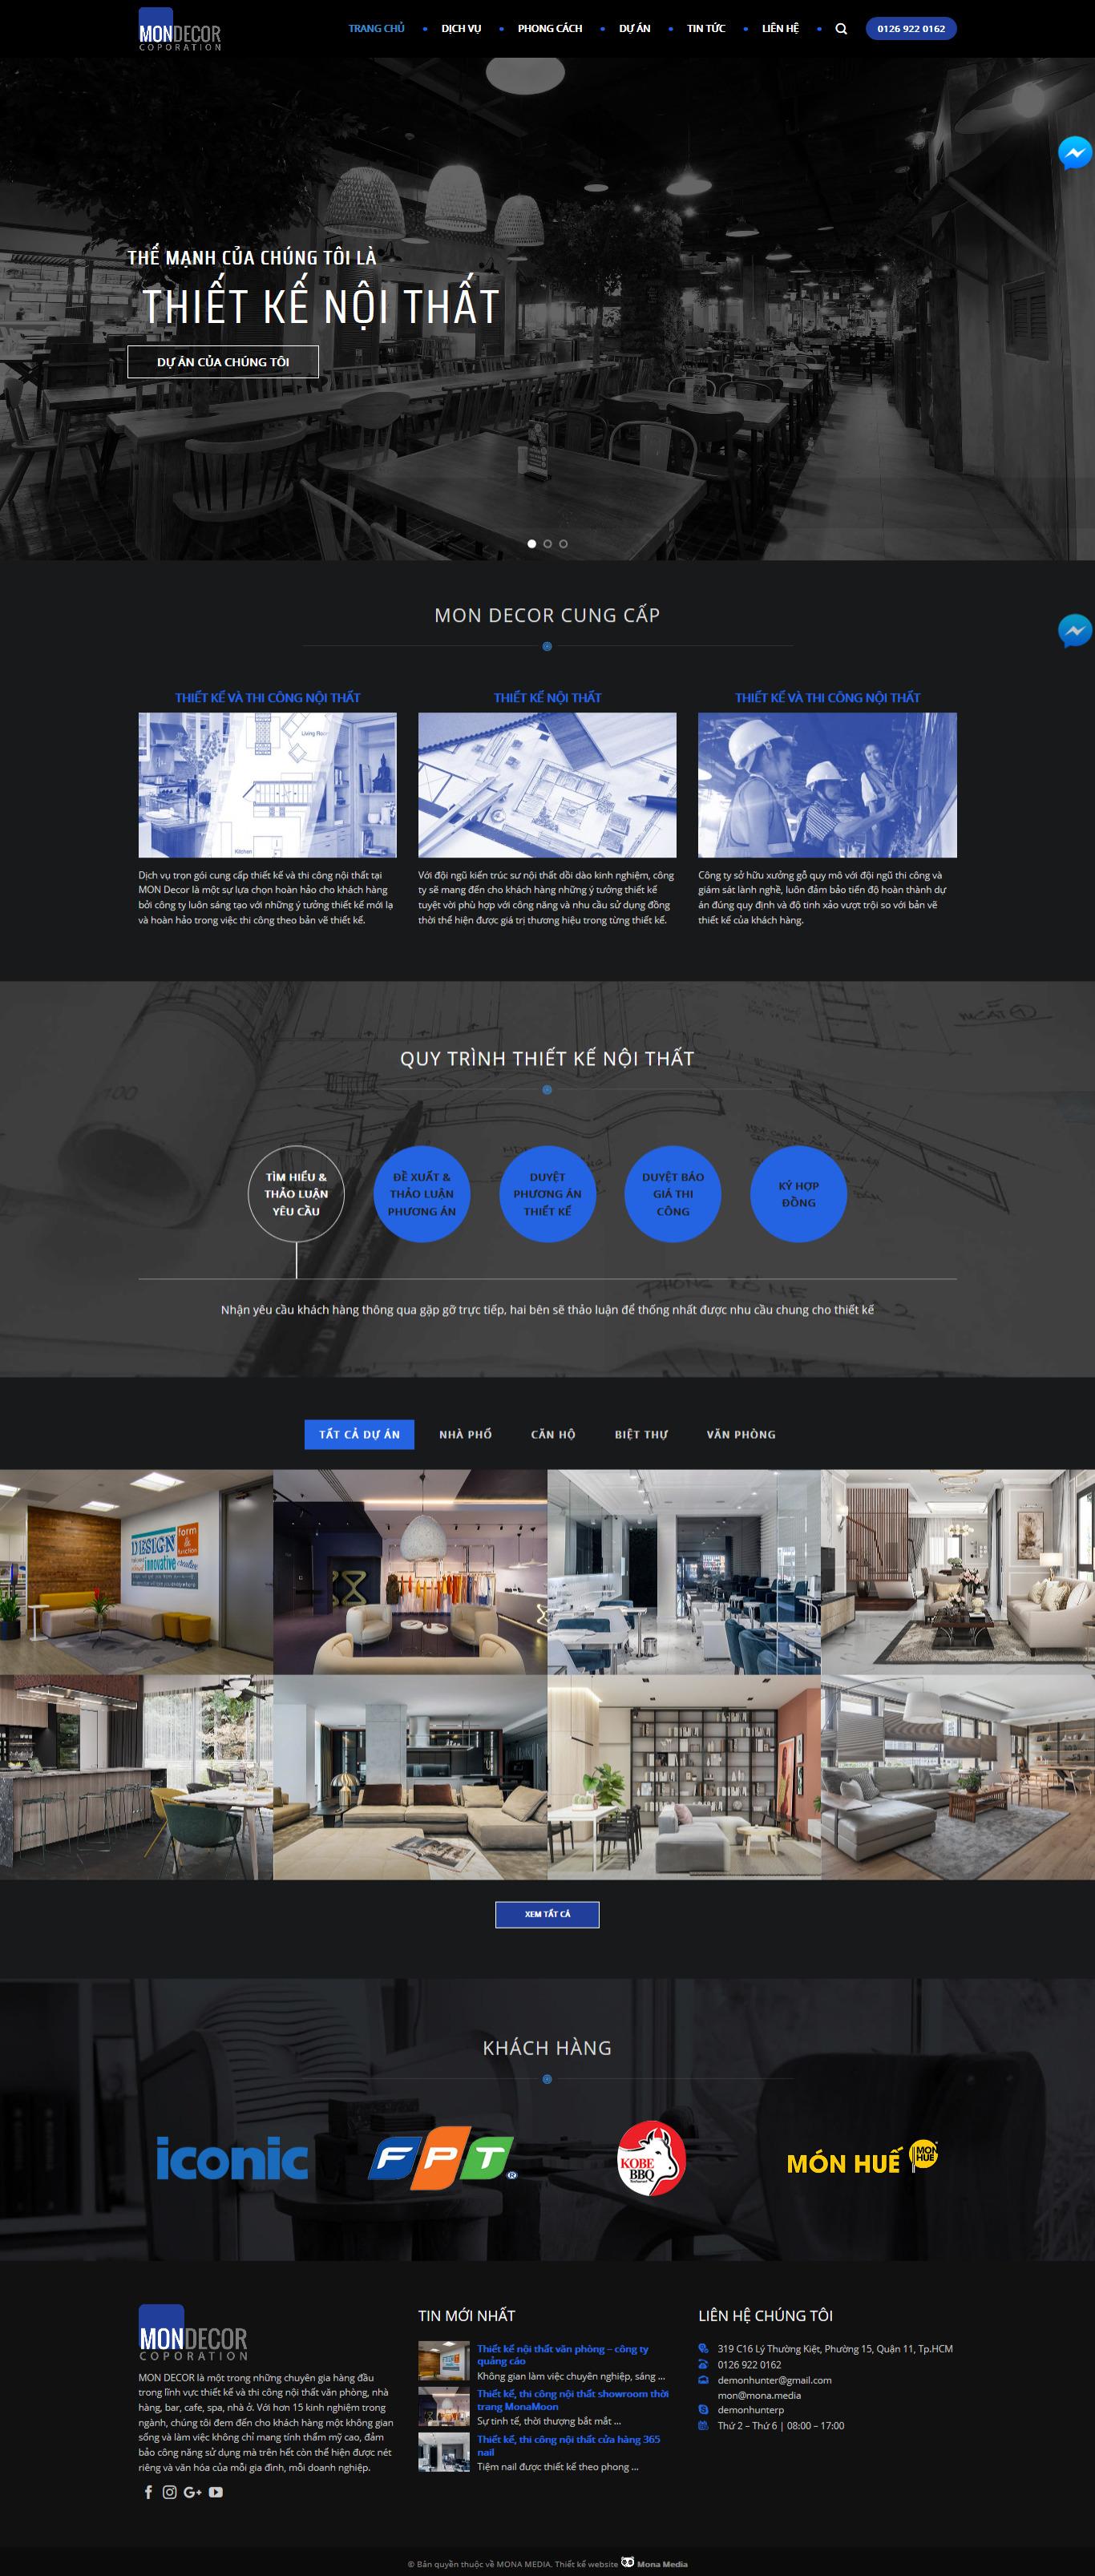 Mẫu website thiết kế nội thất giống adtdecor